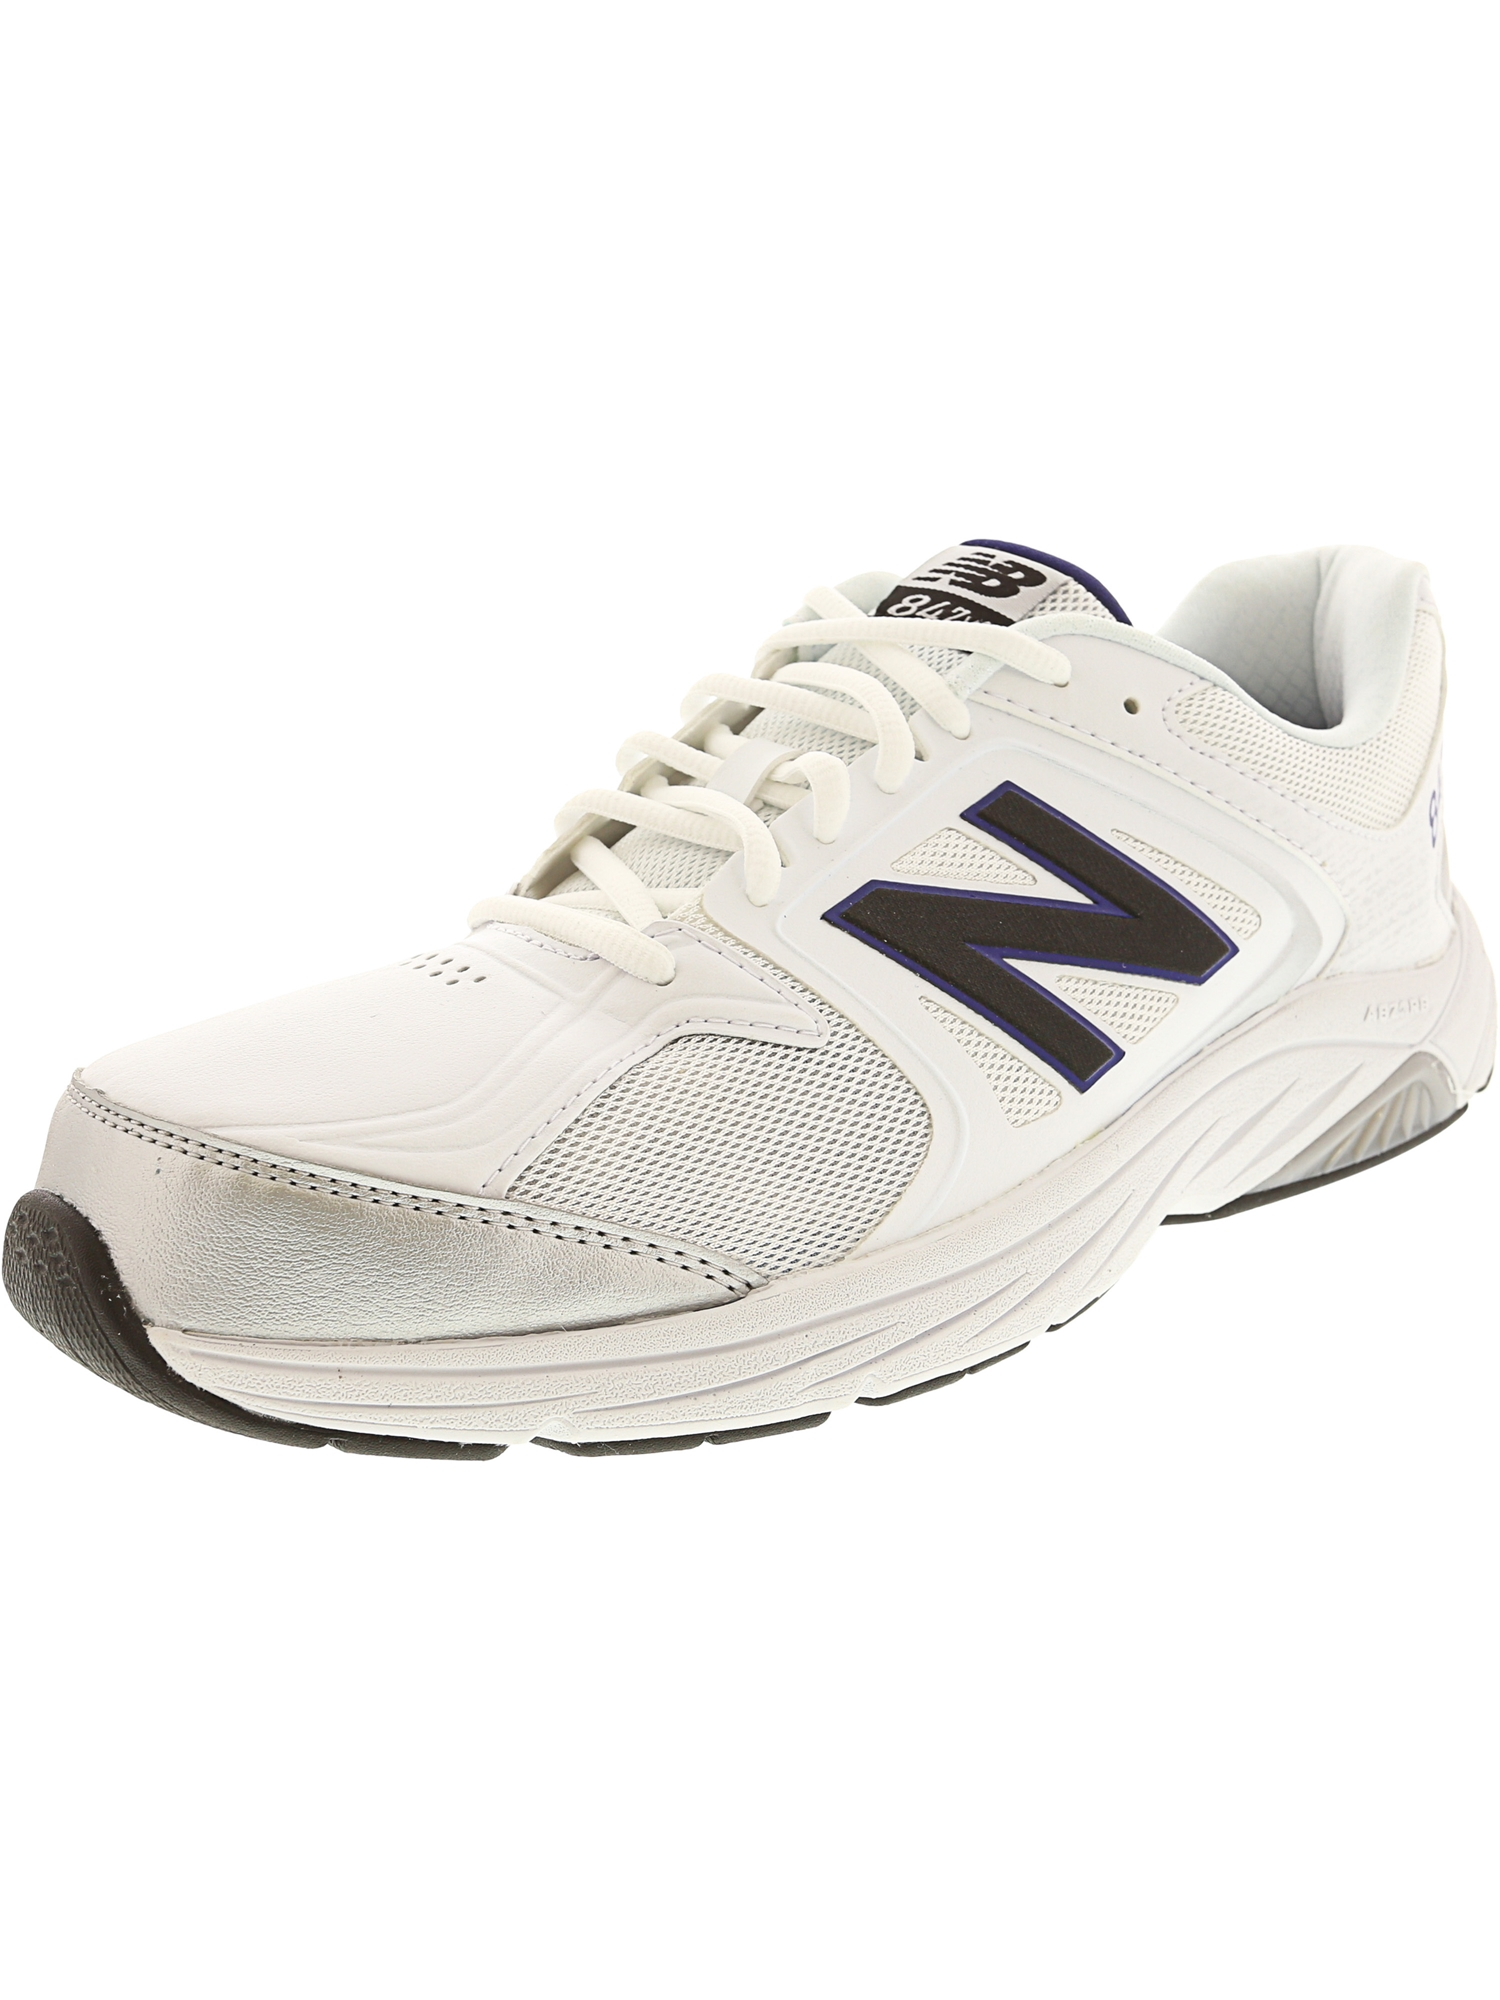 New Balance MW847 Walking Shoe